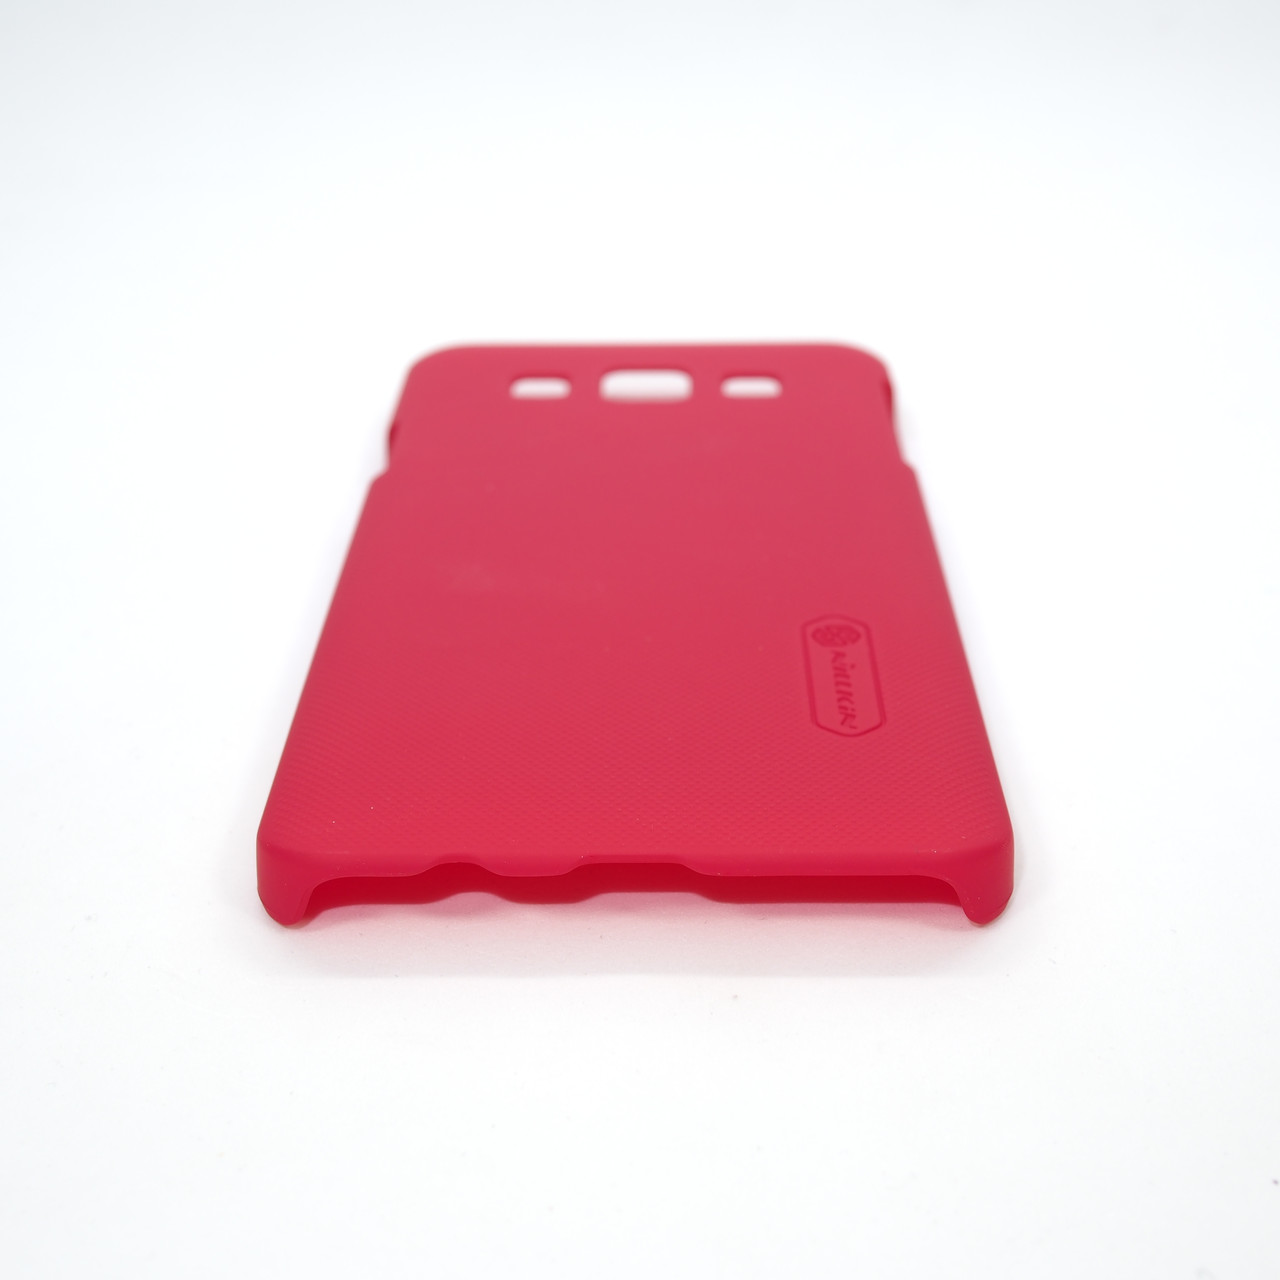 Накладка Nillkin Super Frosted Shield Samsung Galaxy A3 red (a300) 2014 Для телефона